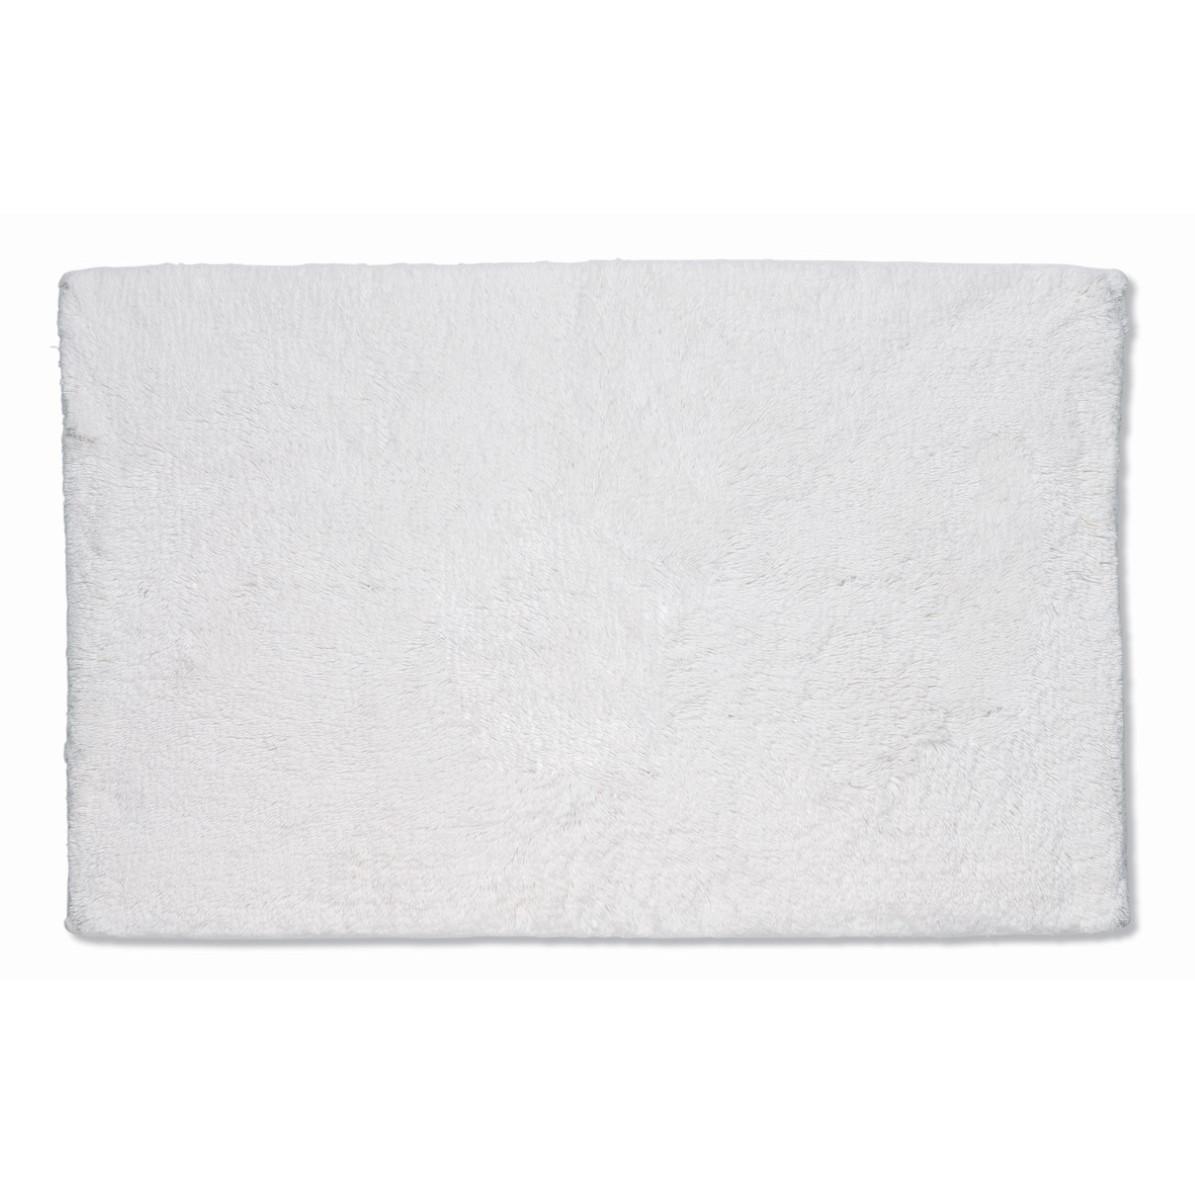 Tapis de Bain Ladessa Blanc Uni | 120 x 70 x 2 cm